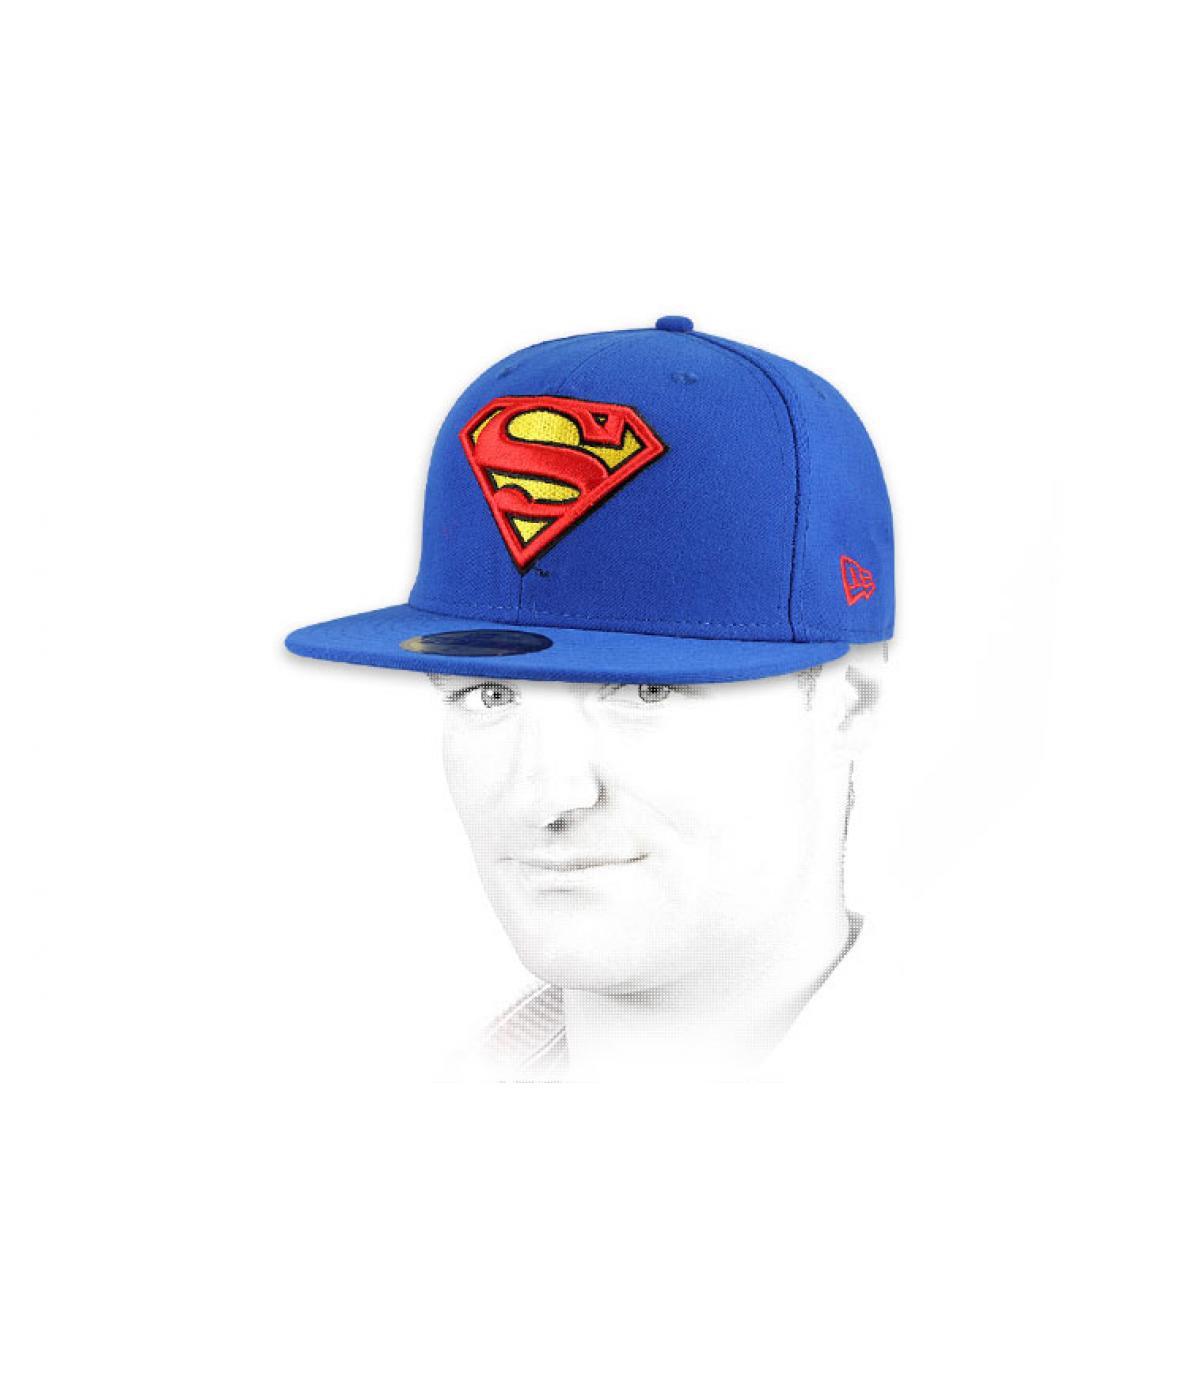 Details Cap Superman black - afbeeling 4